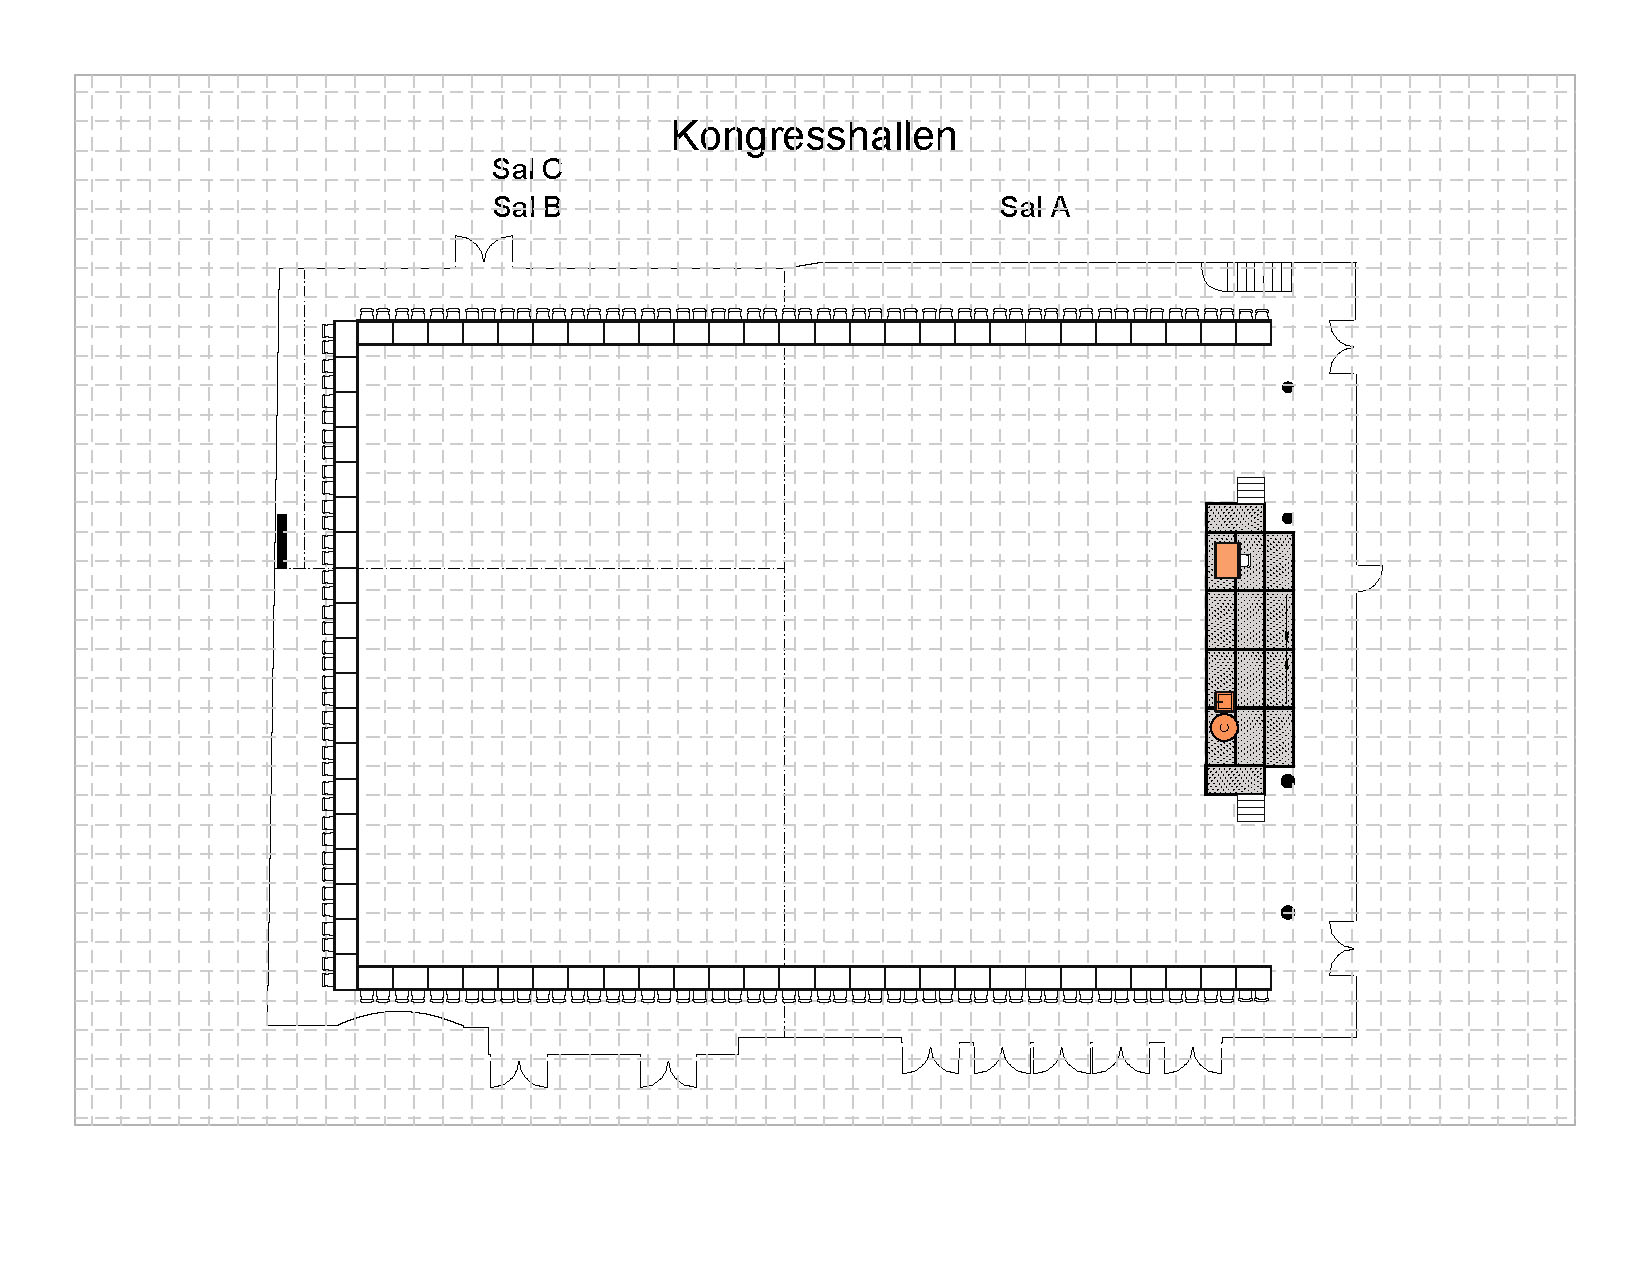 U - Bord 142 plasser